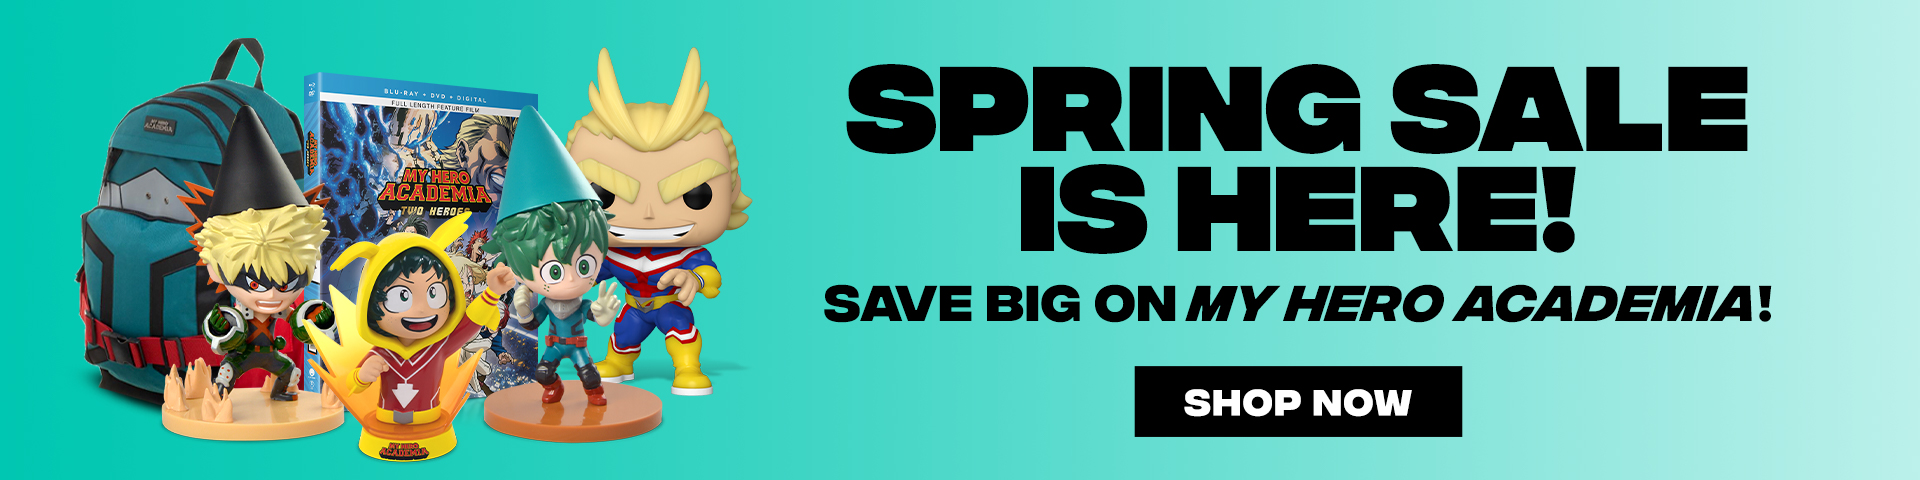 Spring Sale is Here! Save Big on My Hero Academia!